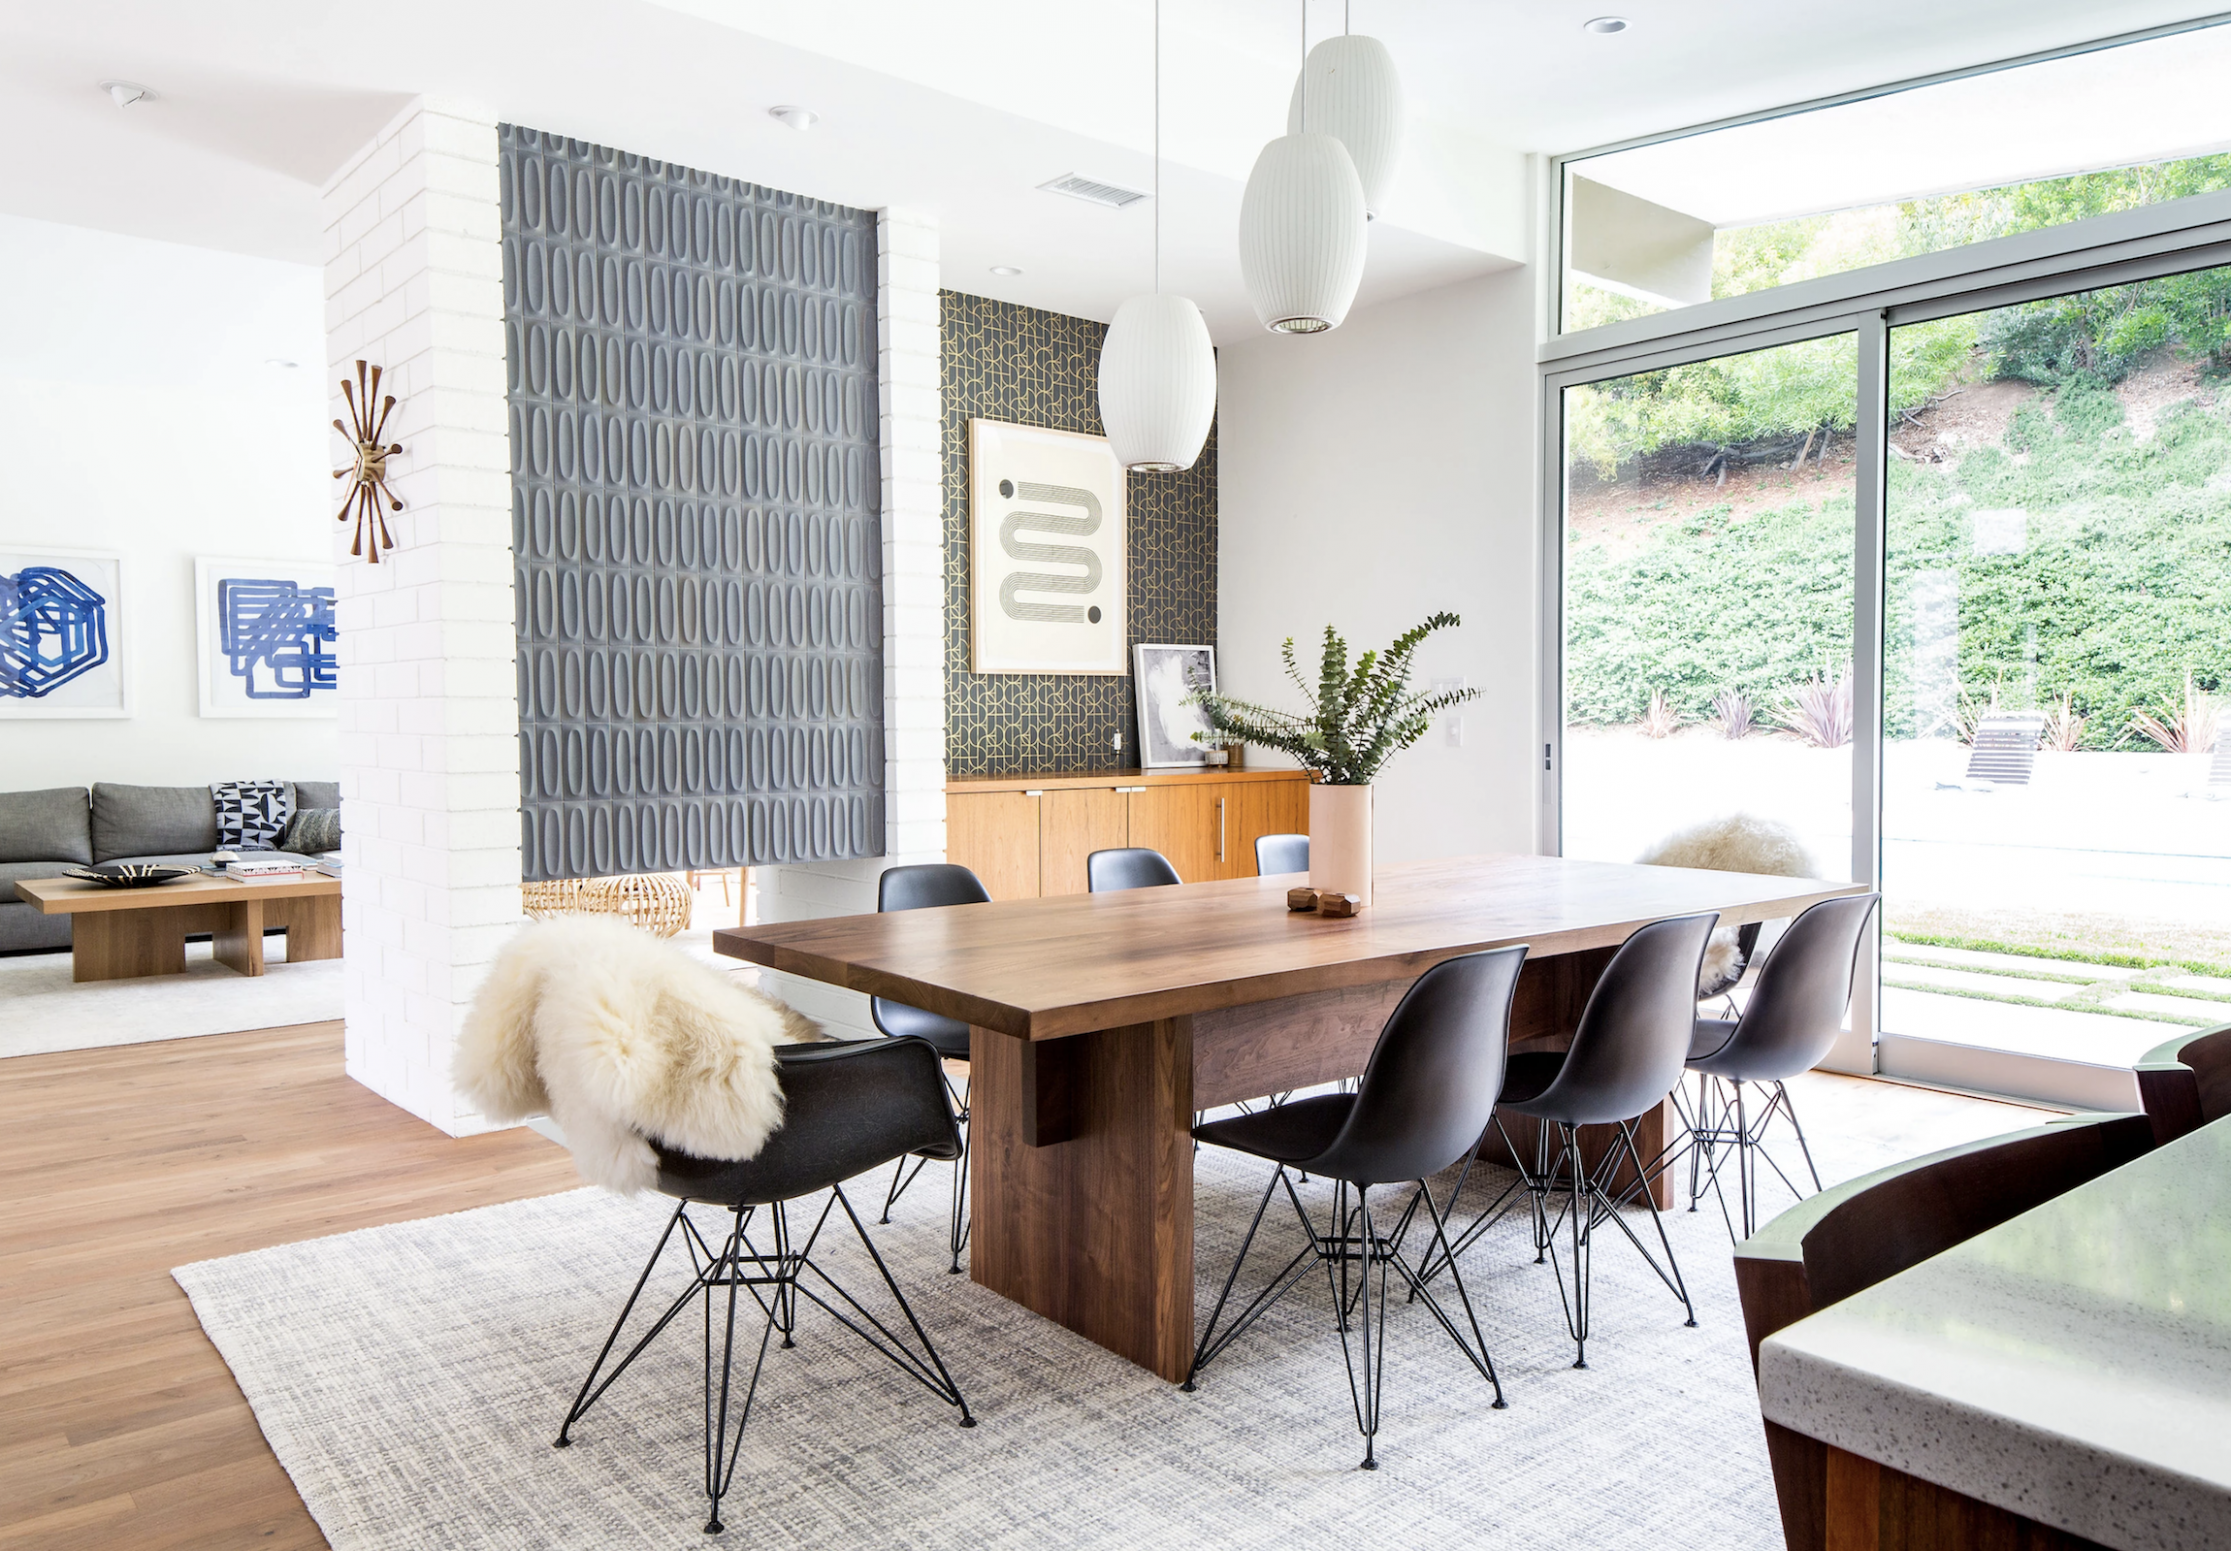 11 Dining Room Lighting Fixtures - Stylish Ideas for Dining Room  - Dining Room Lighting Ideas Uk